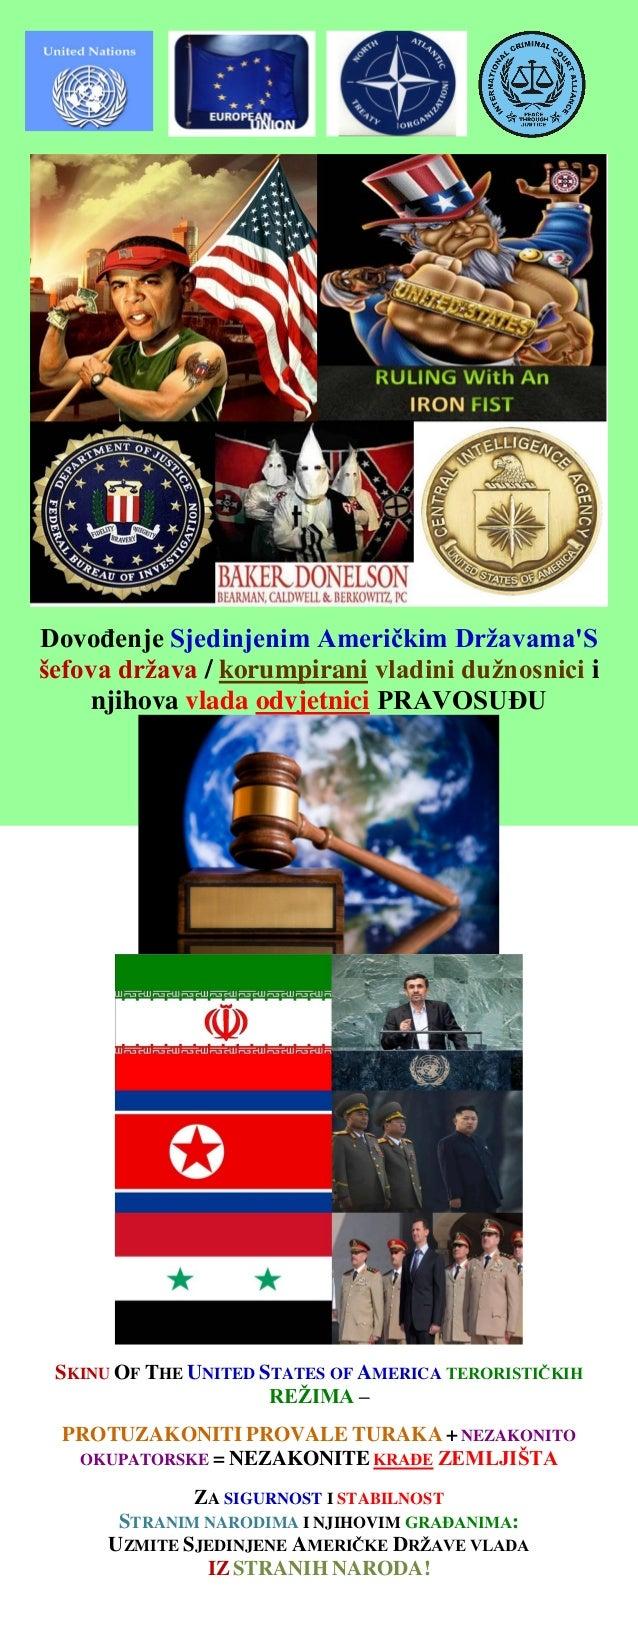 04/14/13   PUBLIC NOTICE (03/11/13 FAX TO BARACK OBAMA) - czech